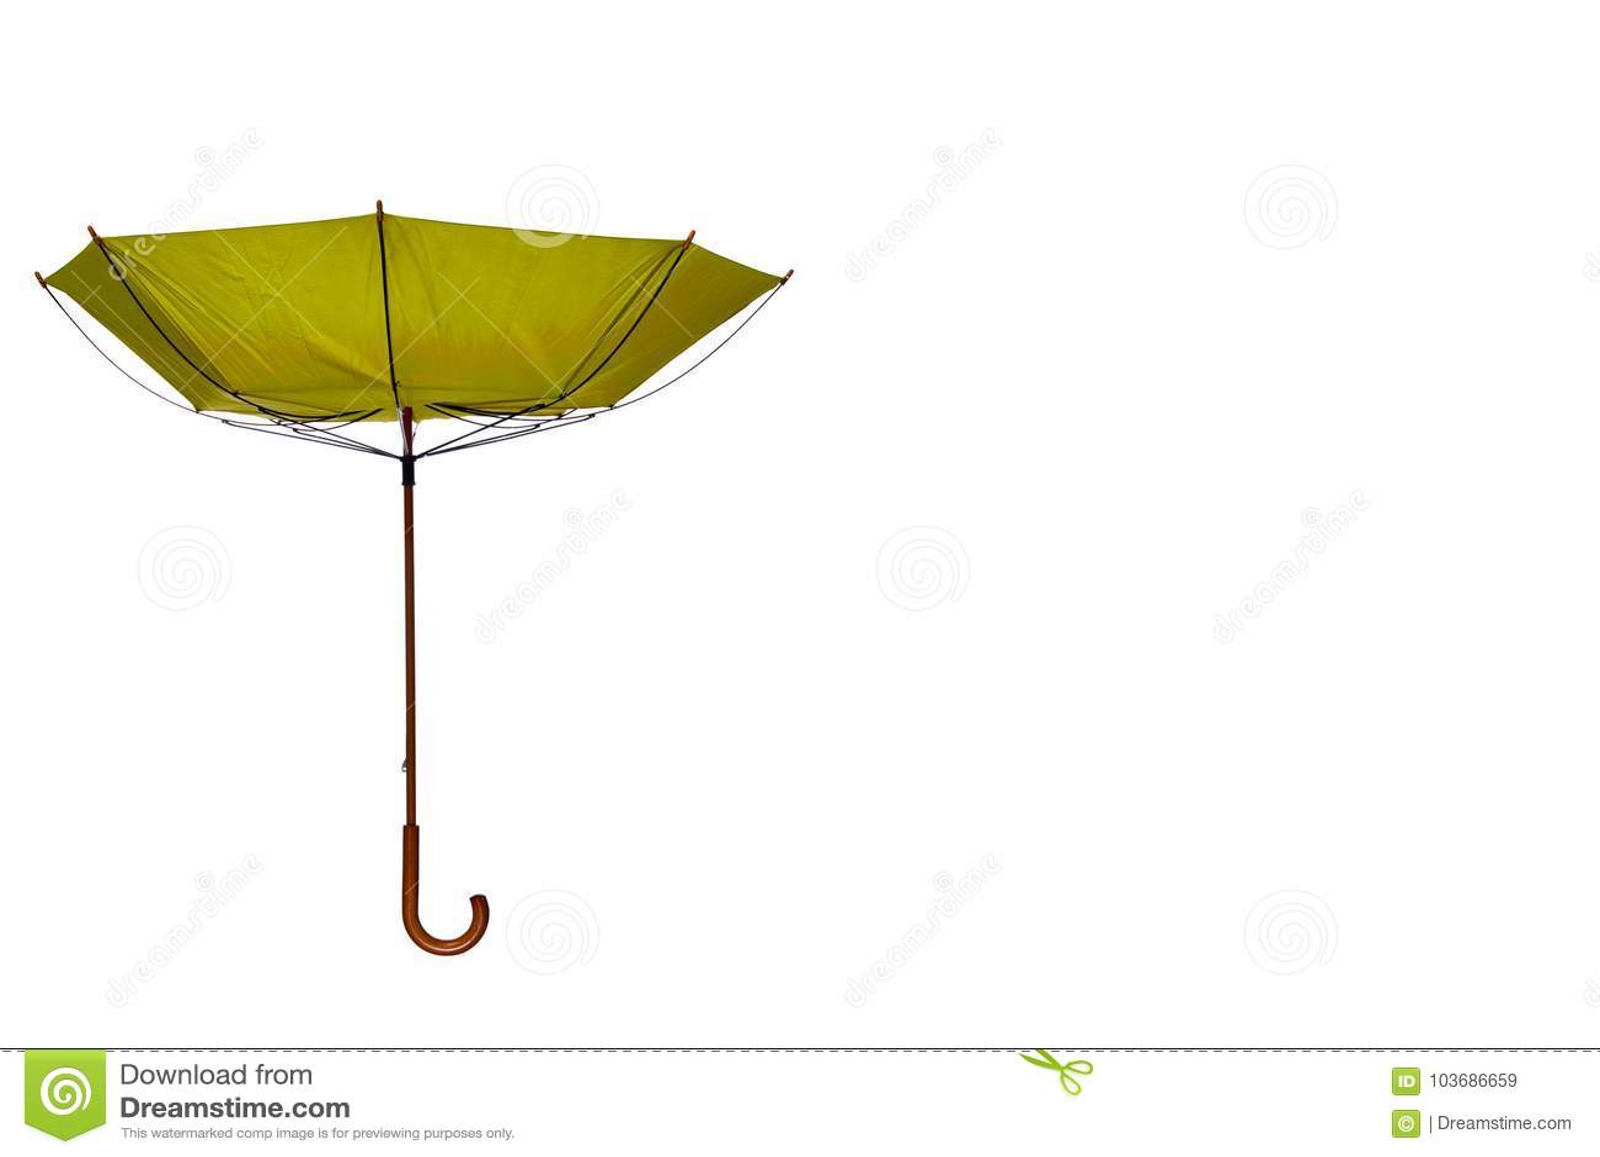 Dentro - do guarda-chuva para fora amarelo descentralizado no fundo branco